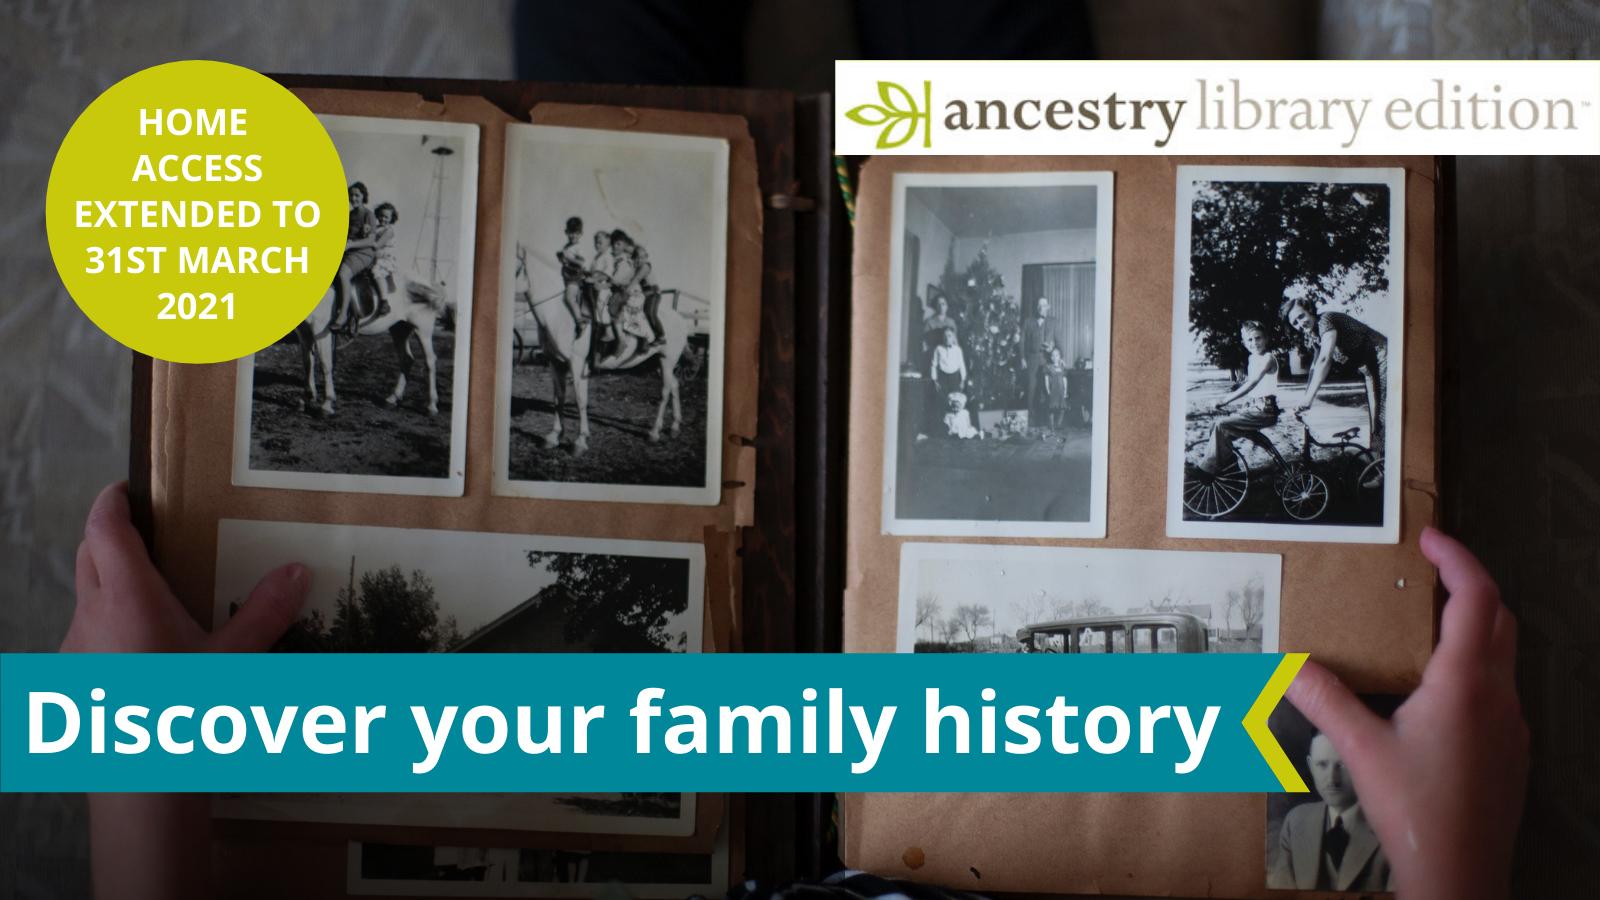 Ancestry Online